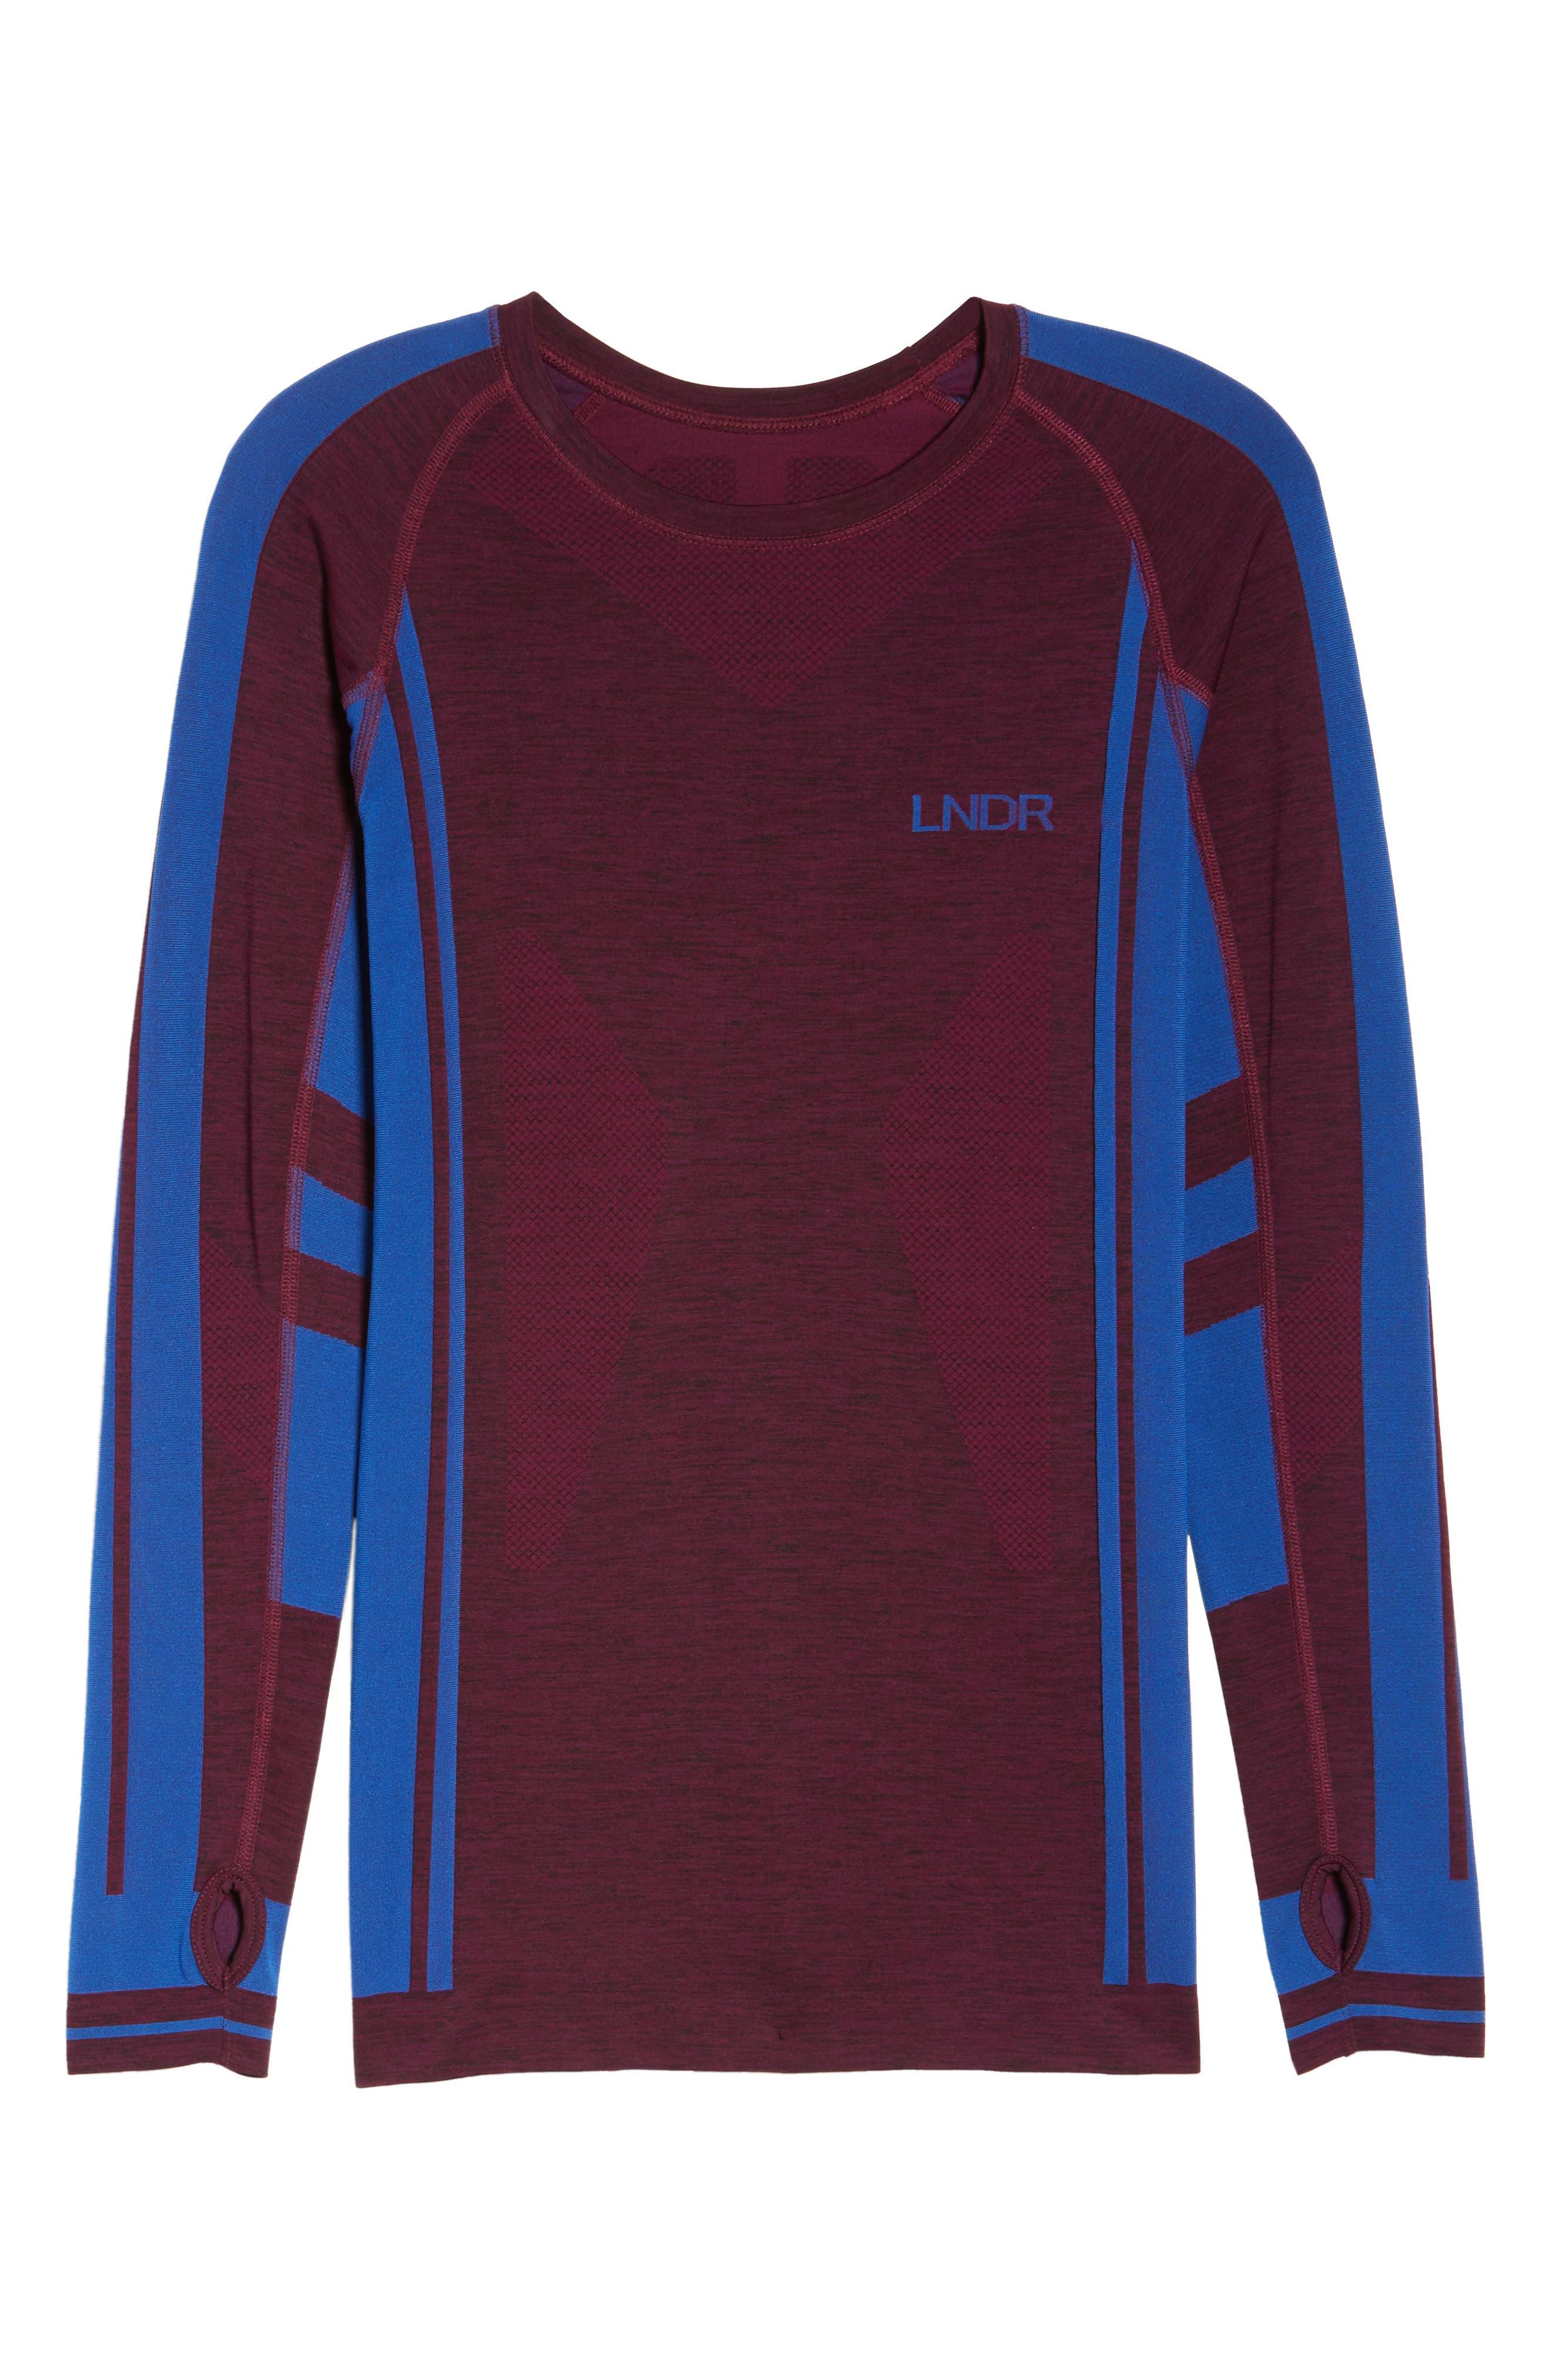 Main Image - LNDR Colours Long Sleeve Top